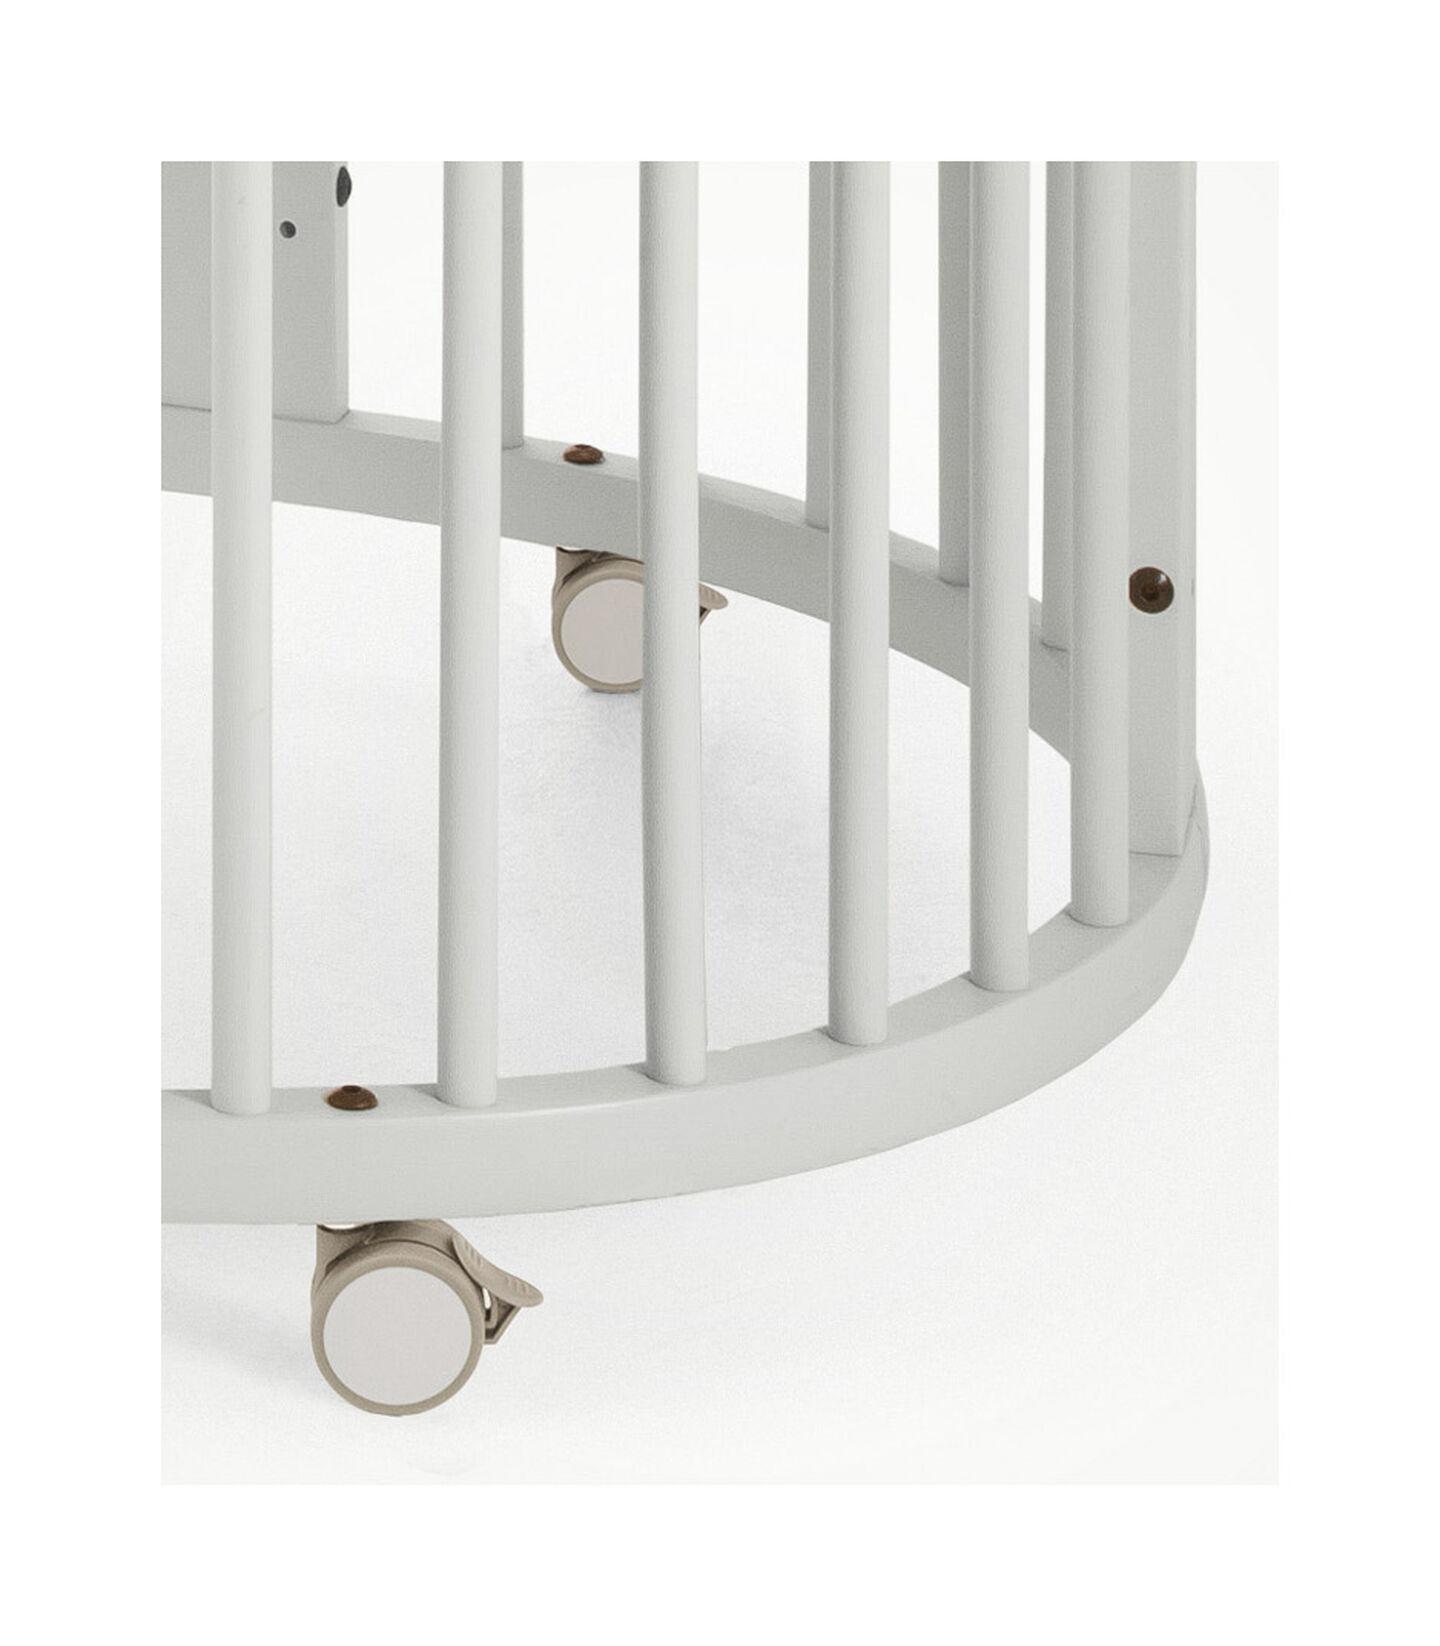 Stokke® Sleepi™ Lit Blanc, Blanc, mainview view 3